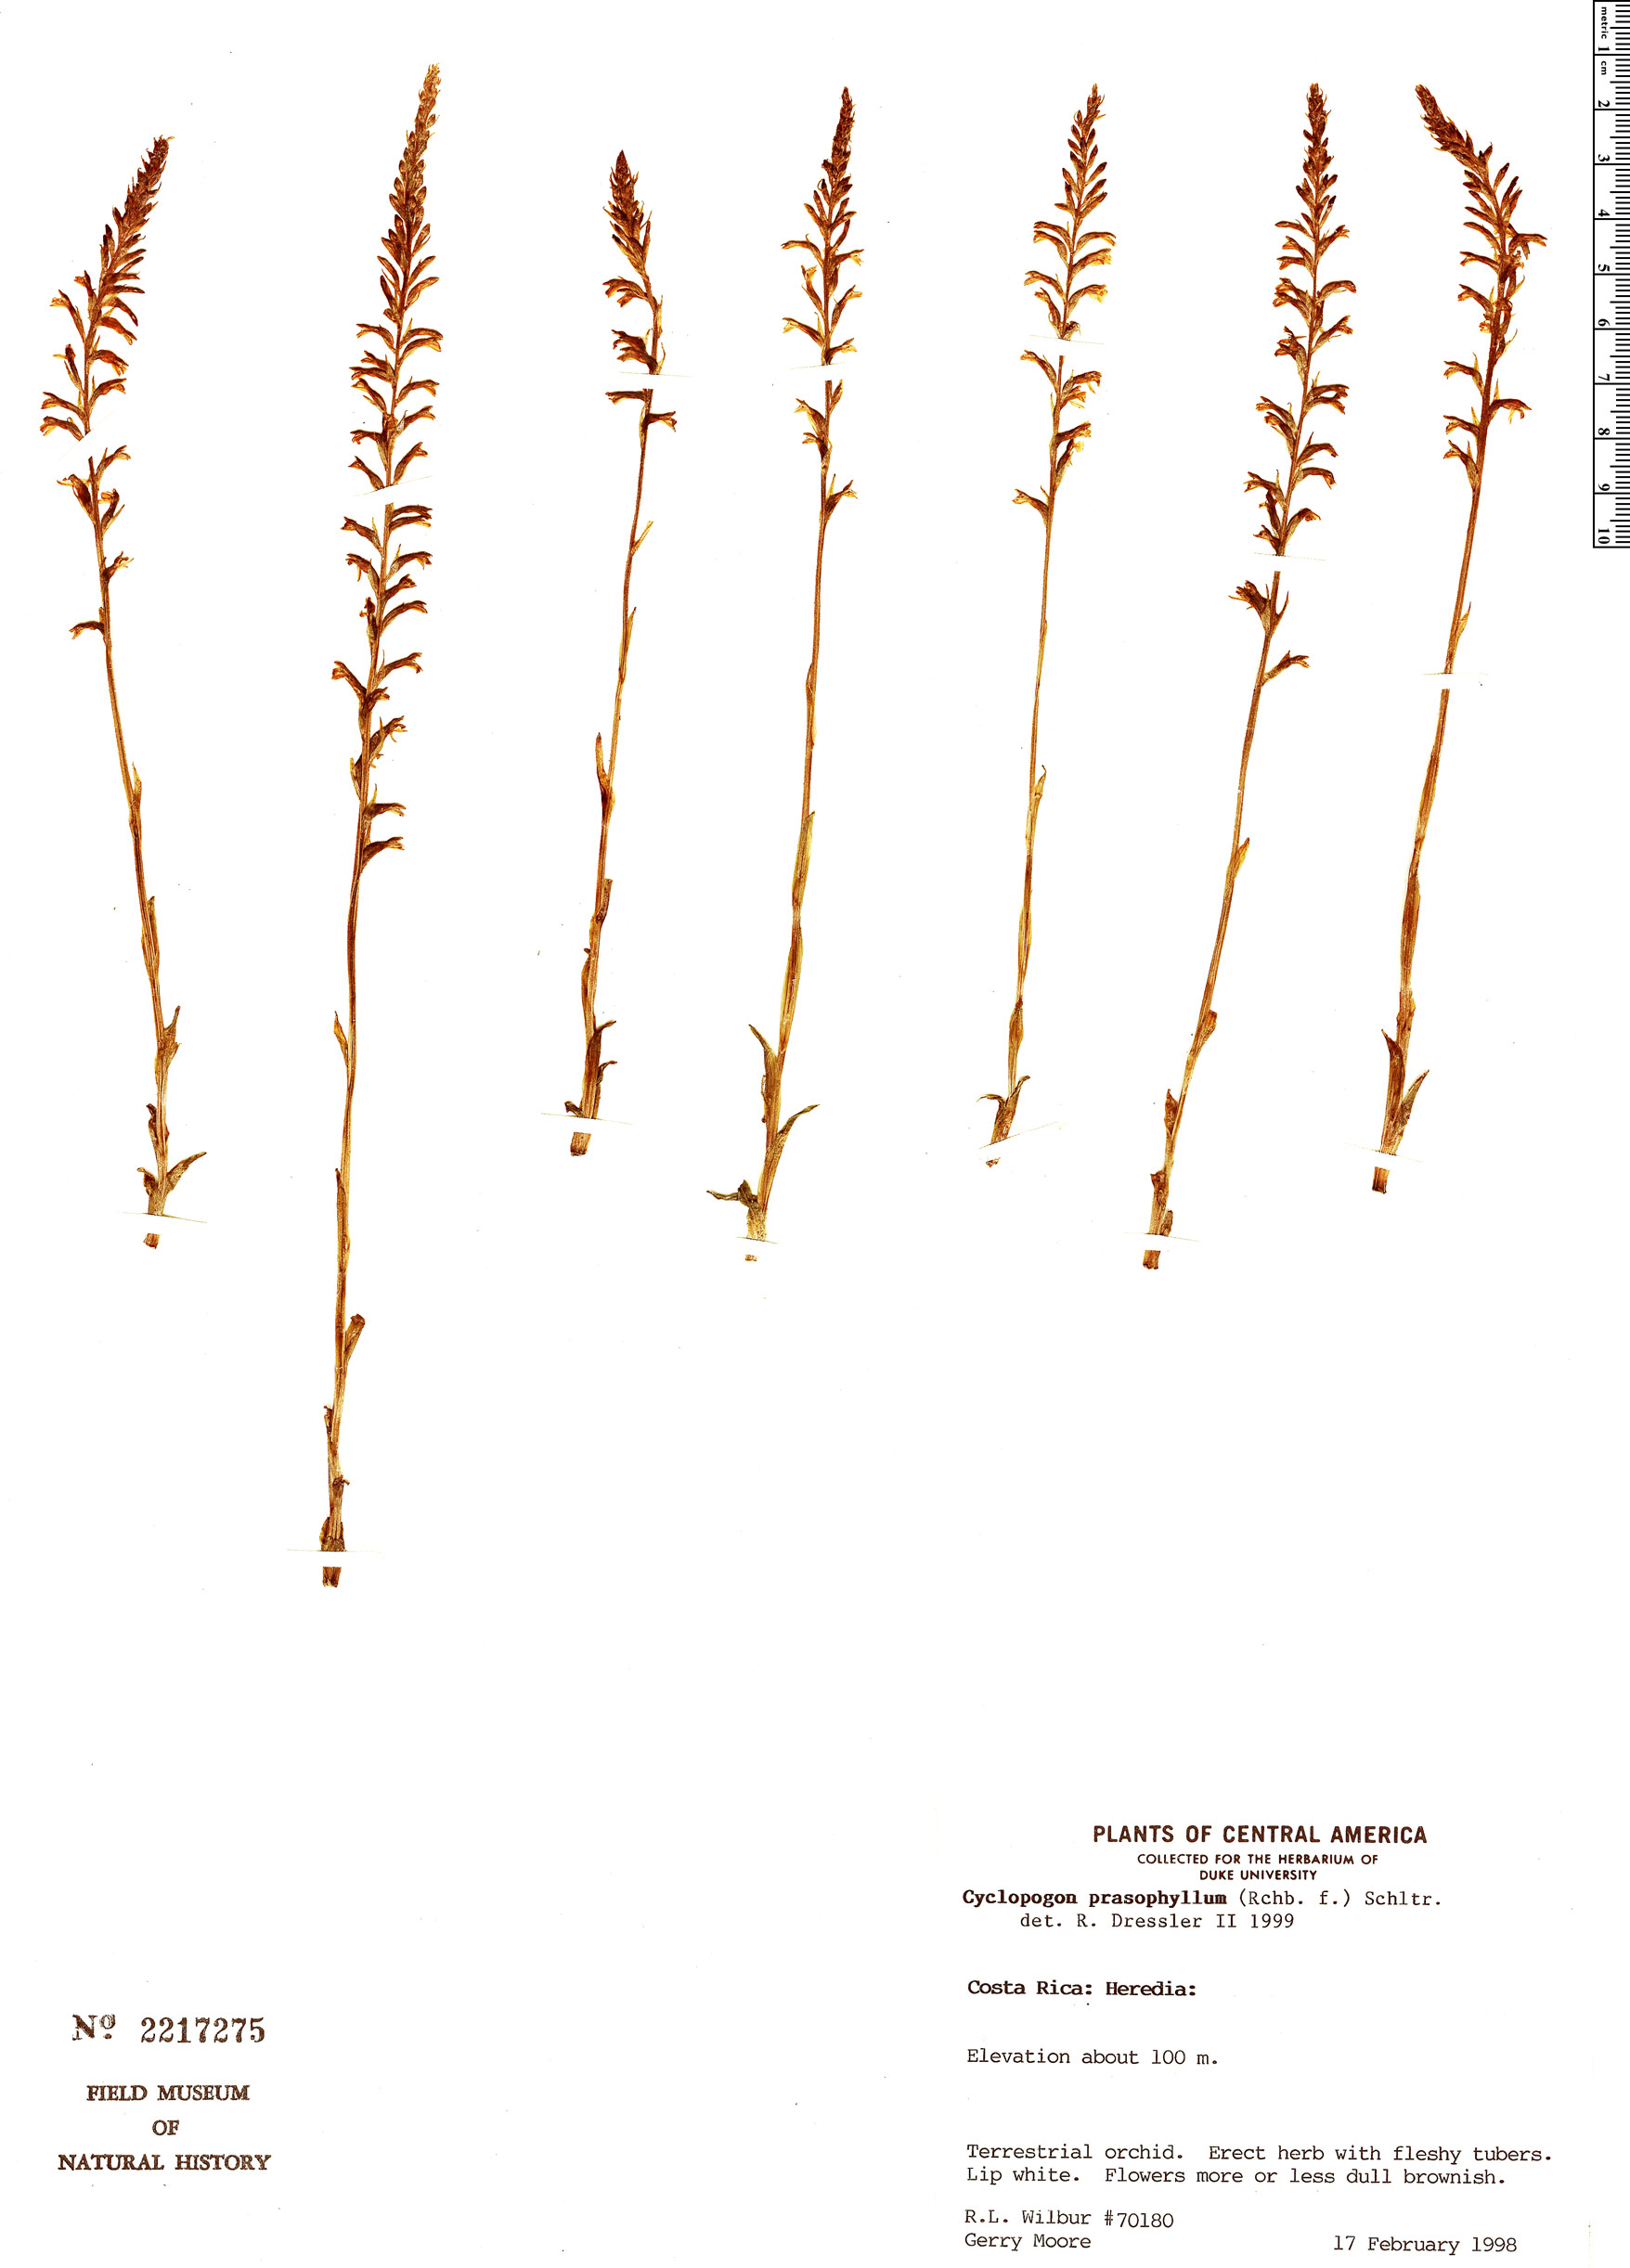 Specimen: Cyclopogon prasophyllus